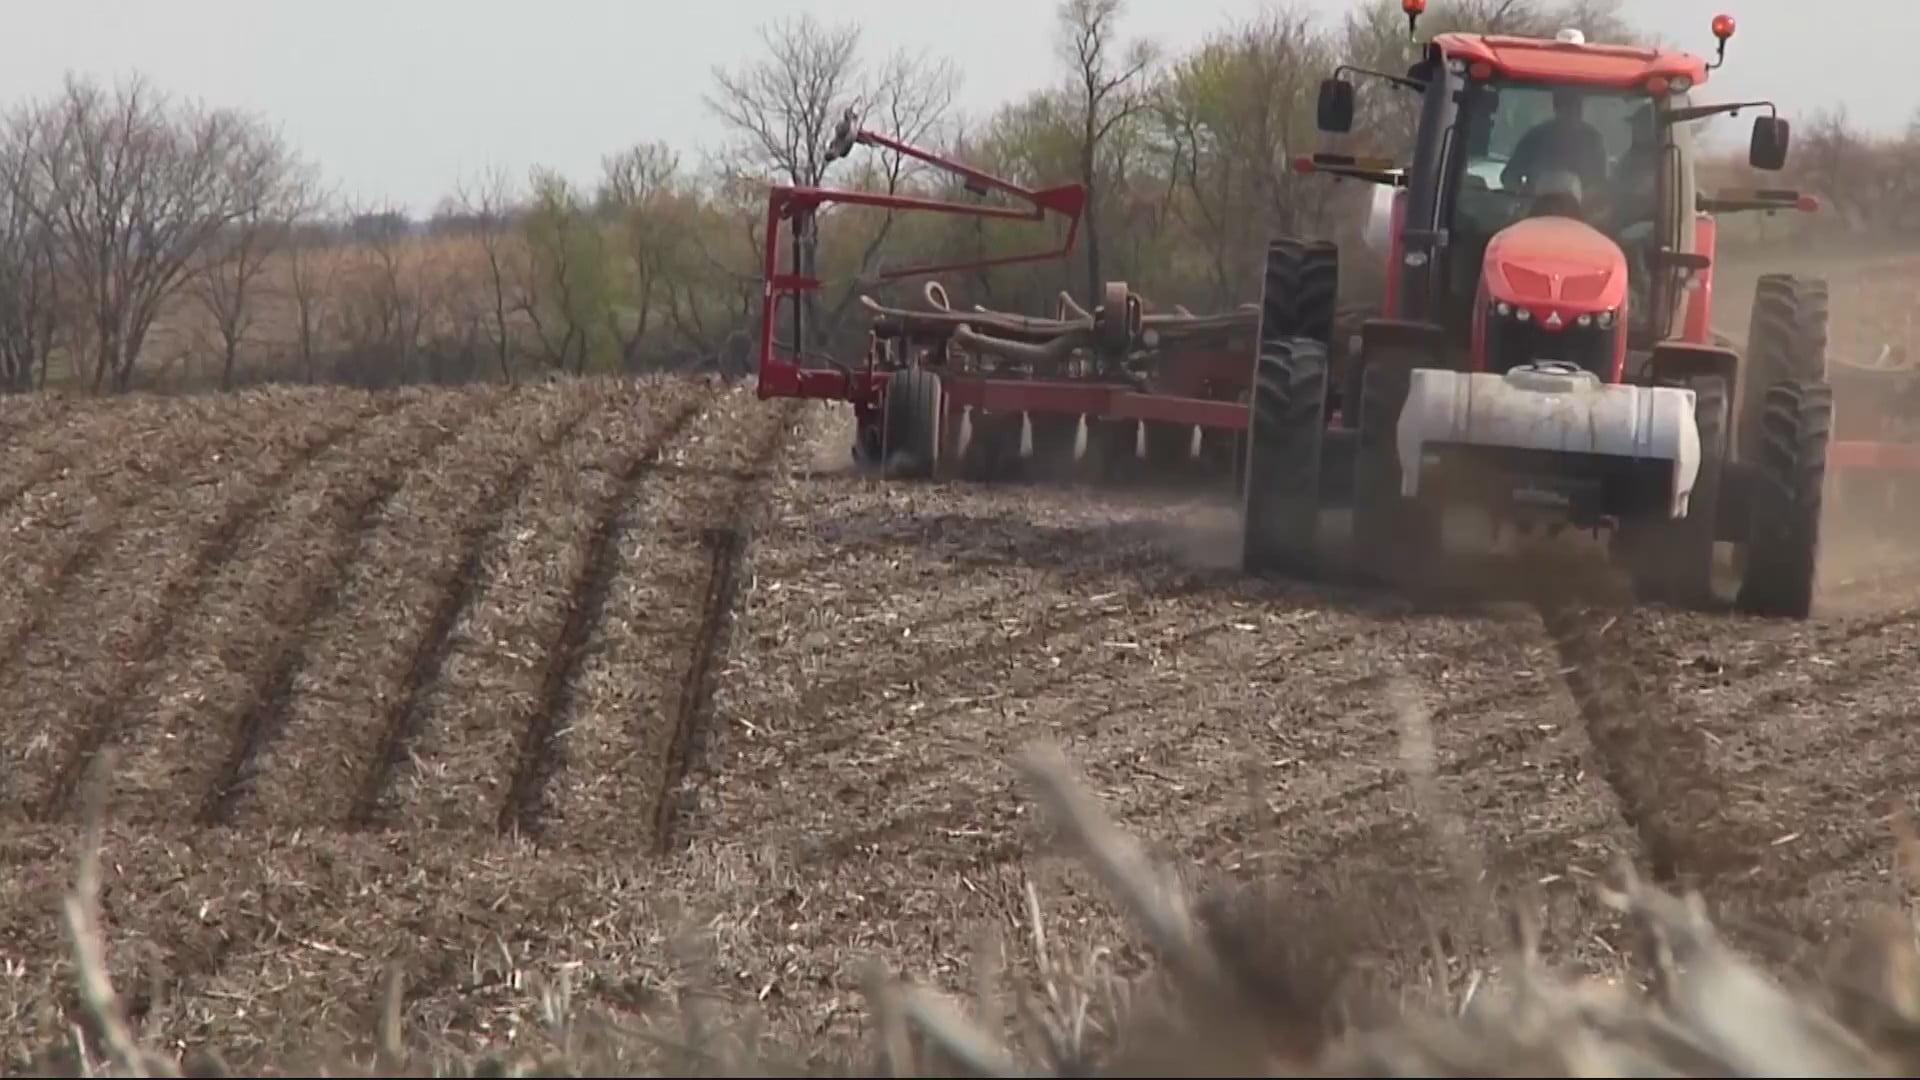 Iowa Farmers Get to Work Planting 8